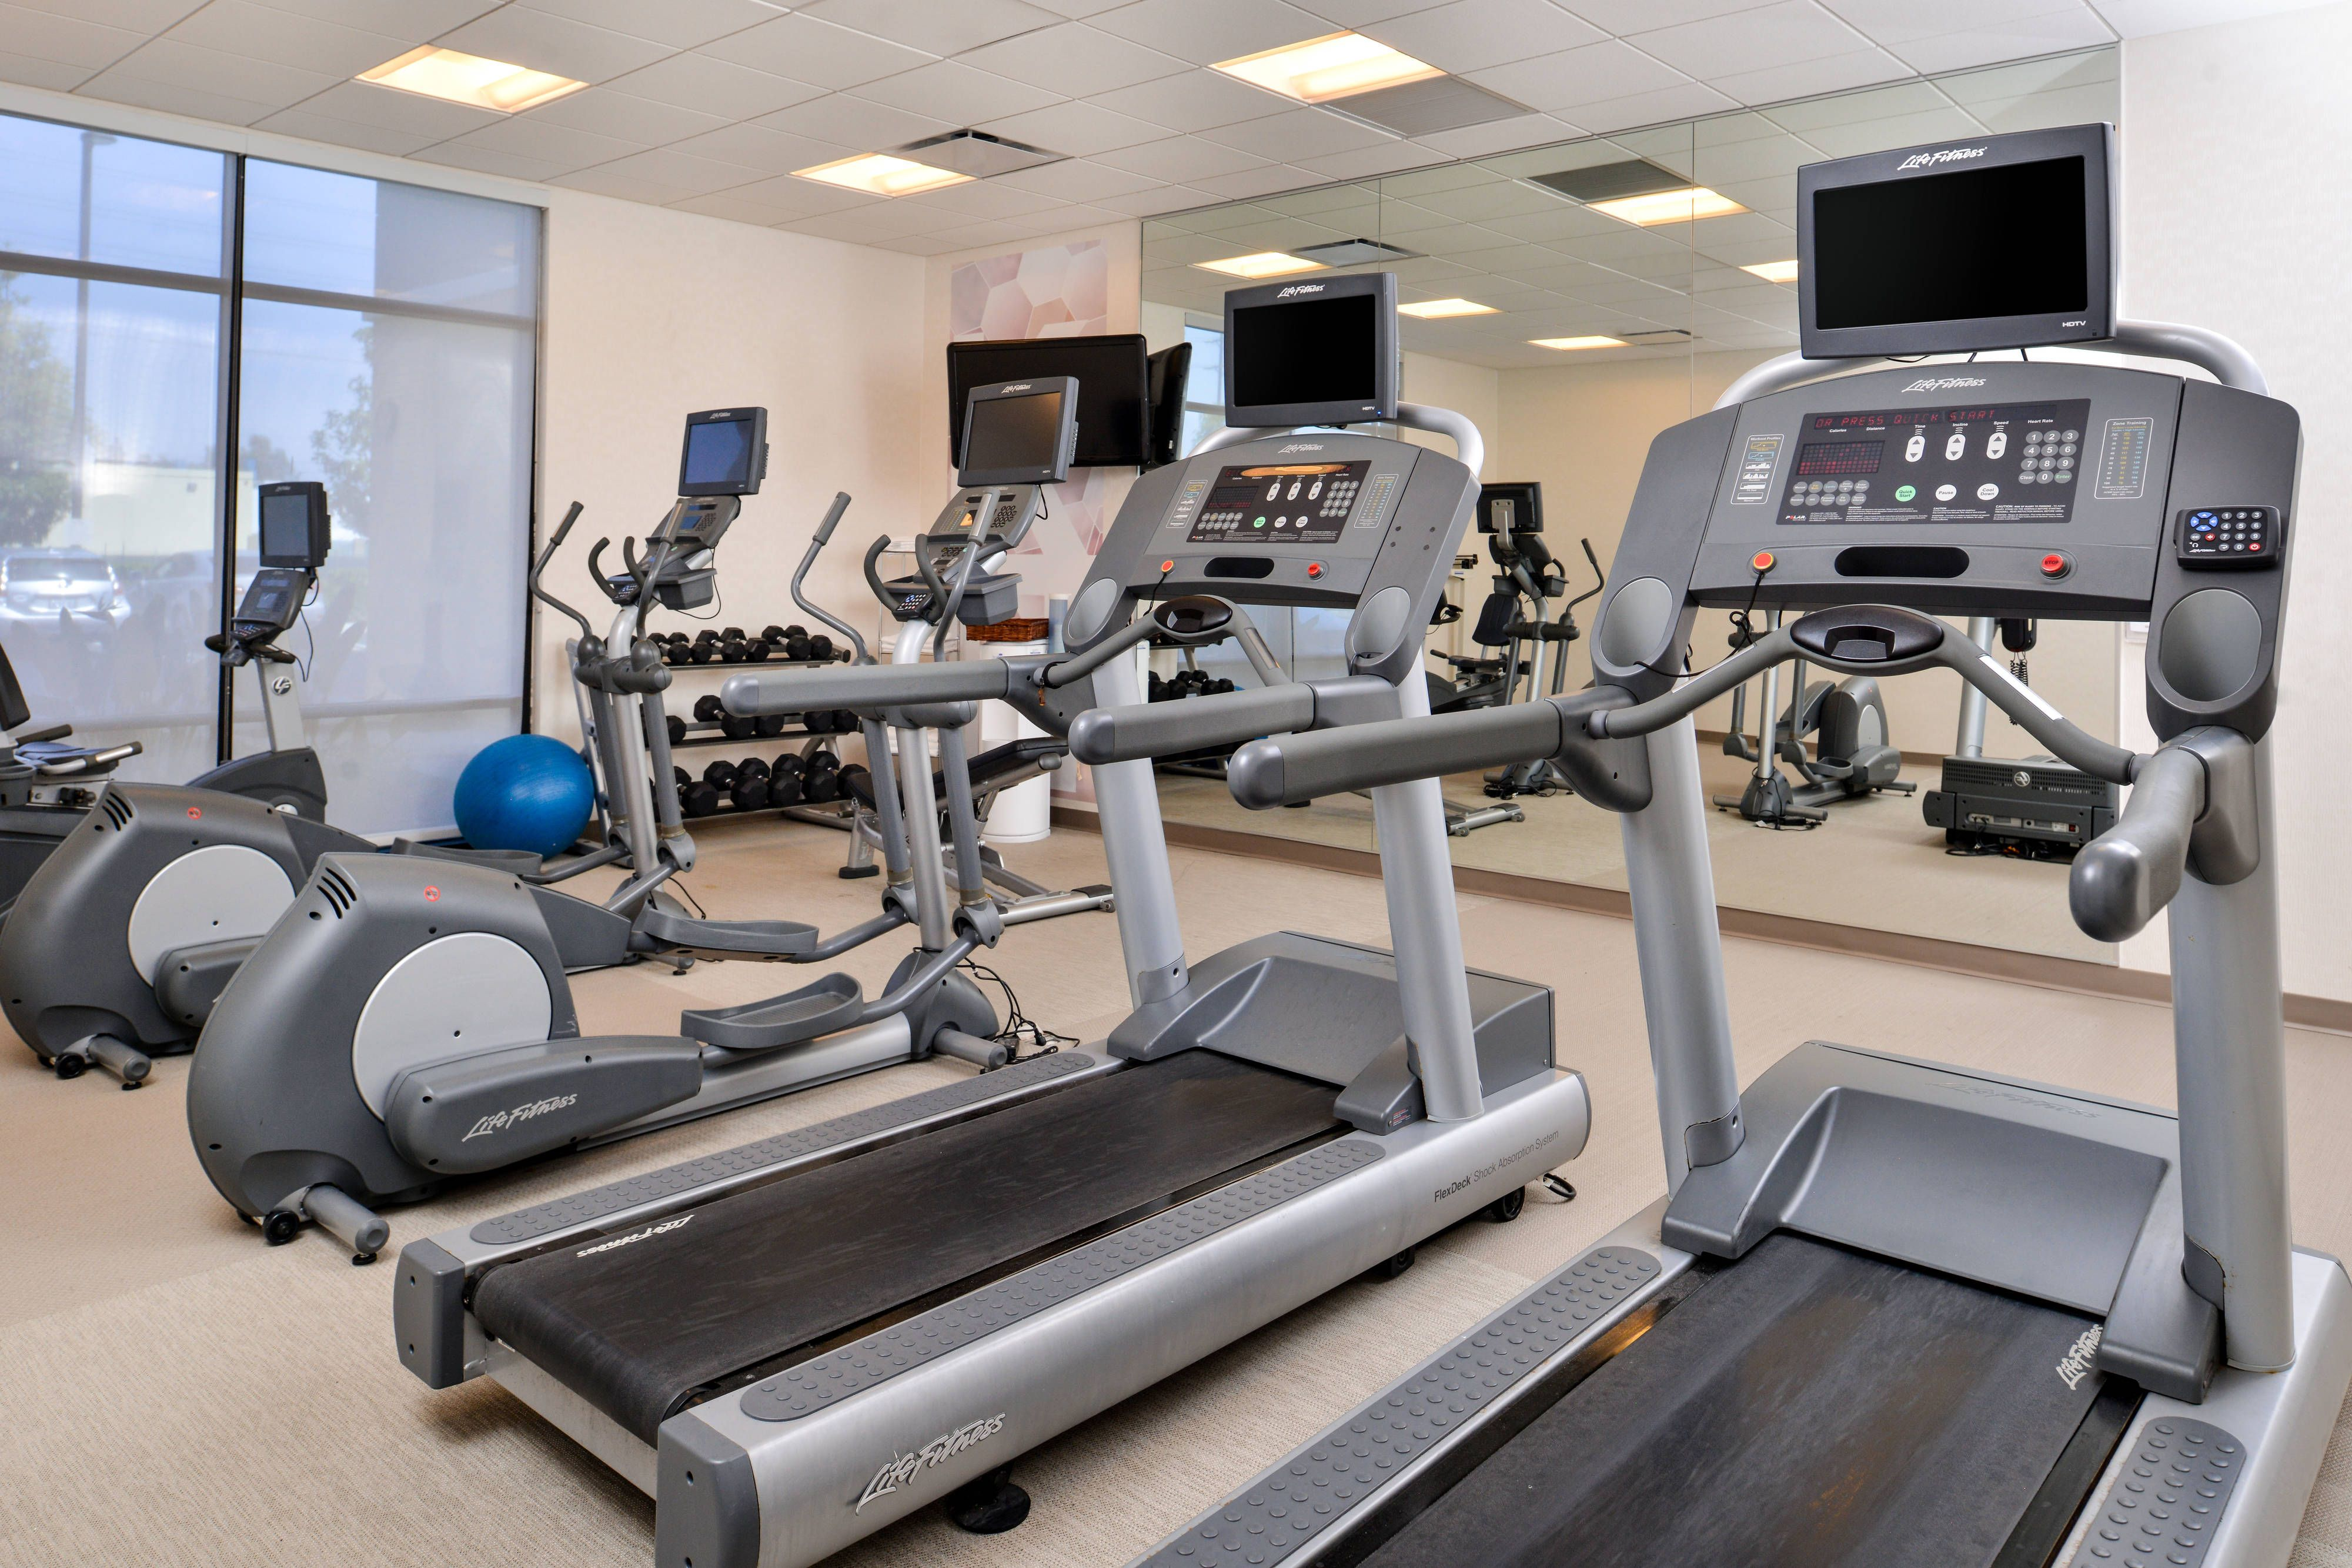 Springhill Suites Irvine John Wayne Airport Orange County Fitness